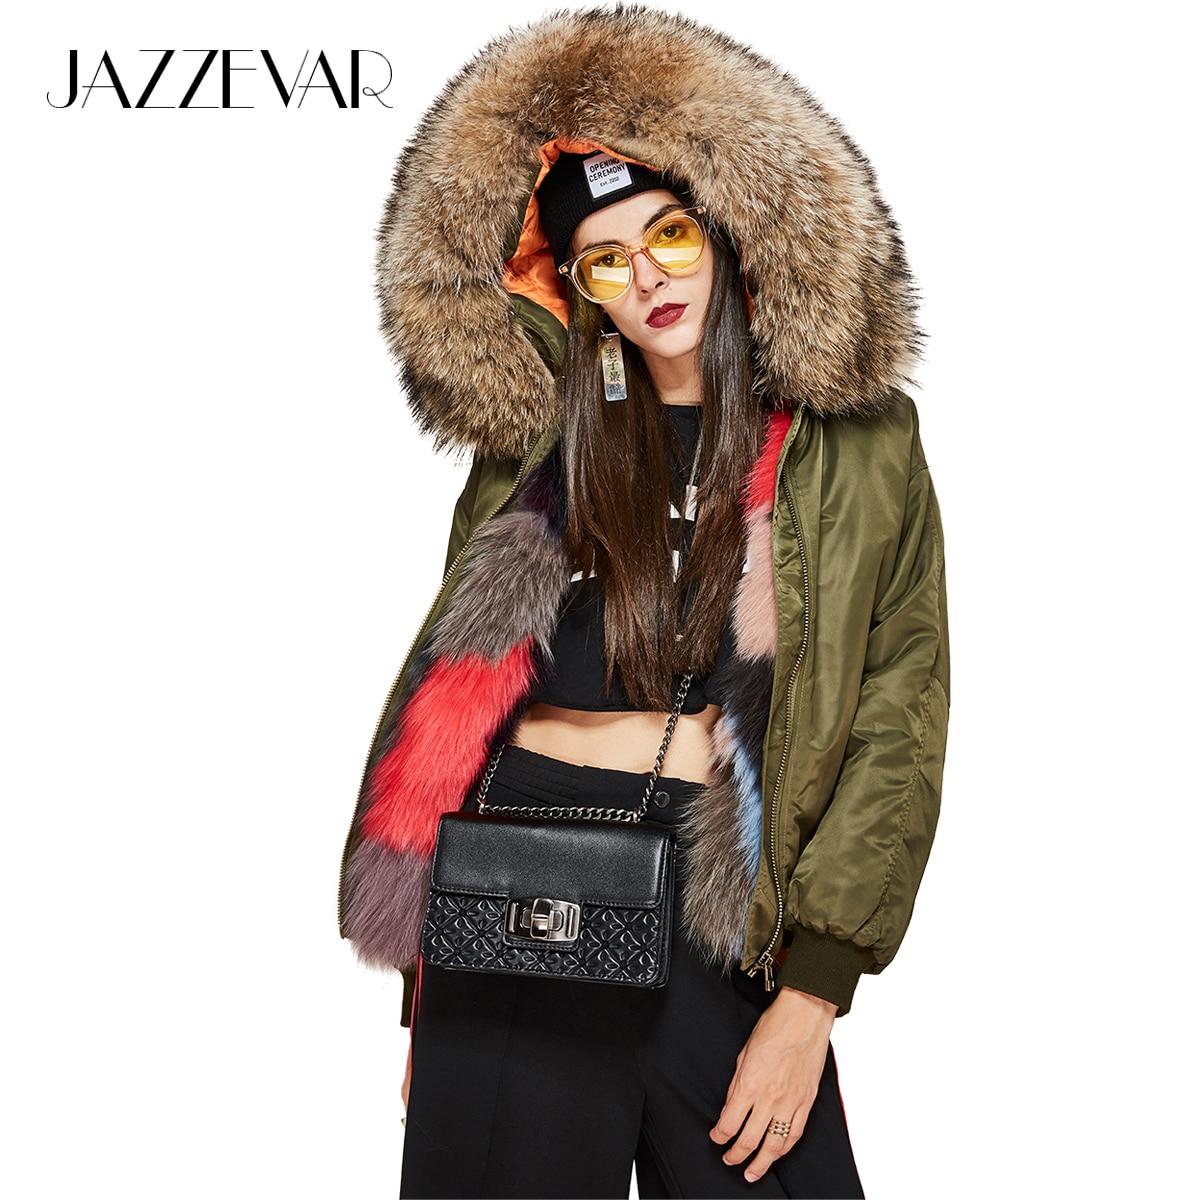 JAZZEVAR 2019 New Winter Fashion street women s luxurious multicolor fox fur lining bomber jacket large